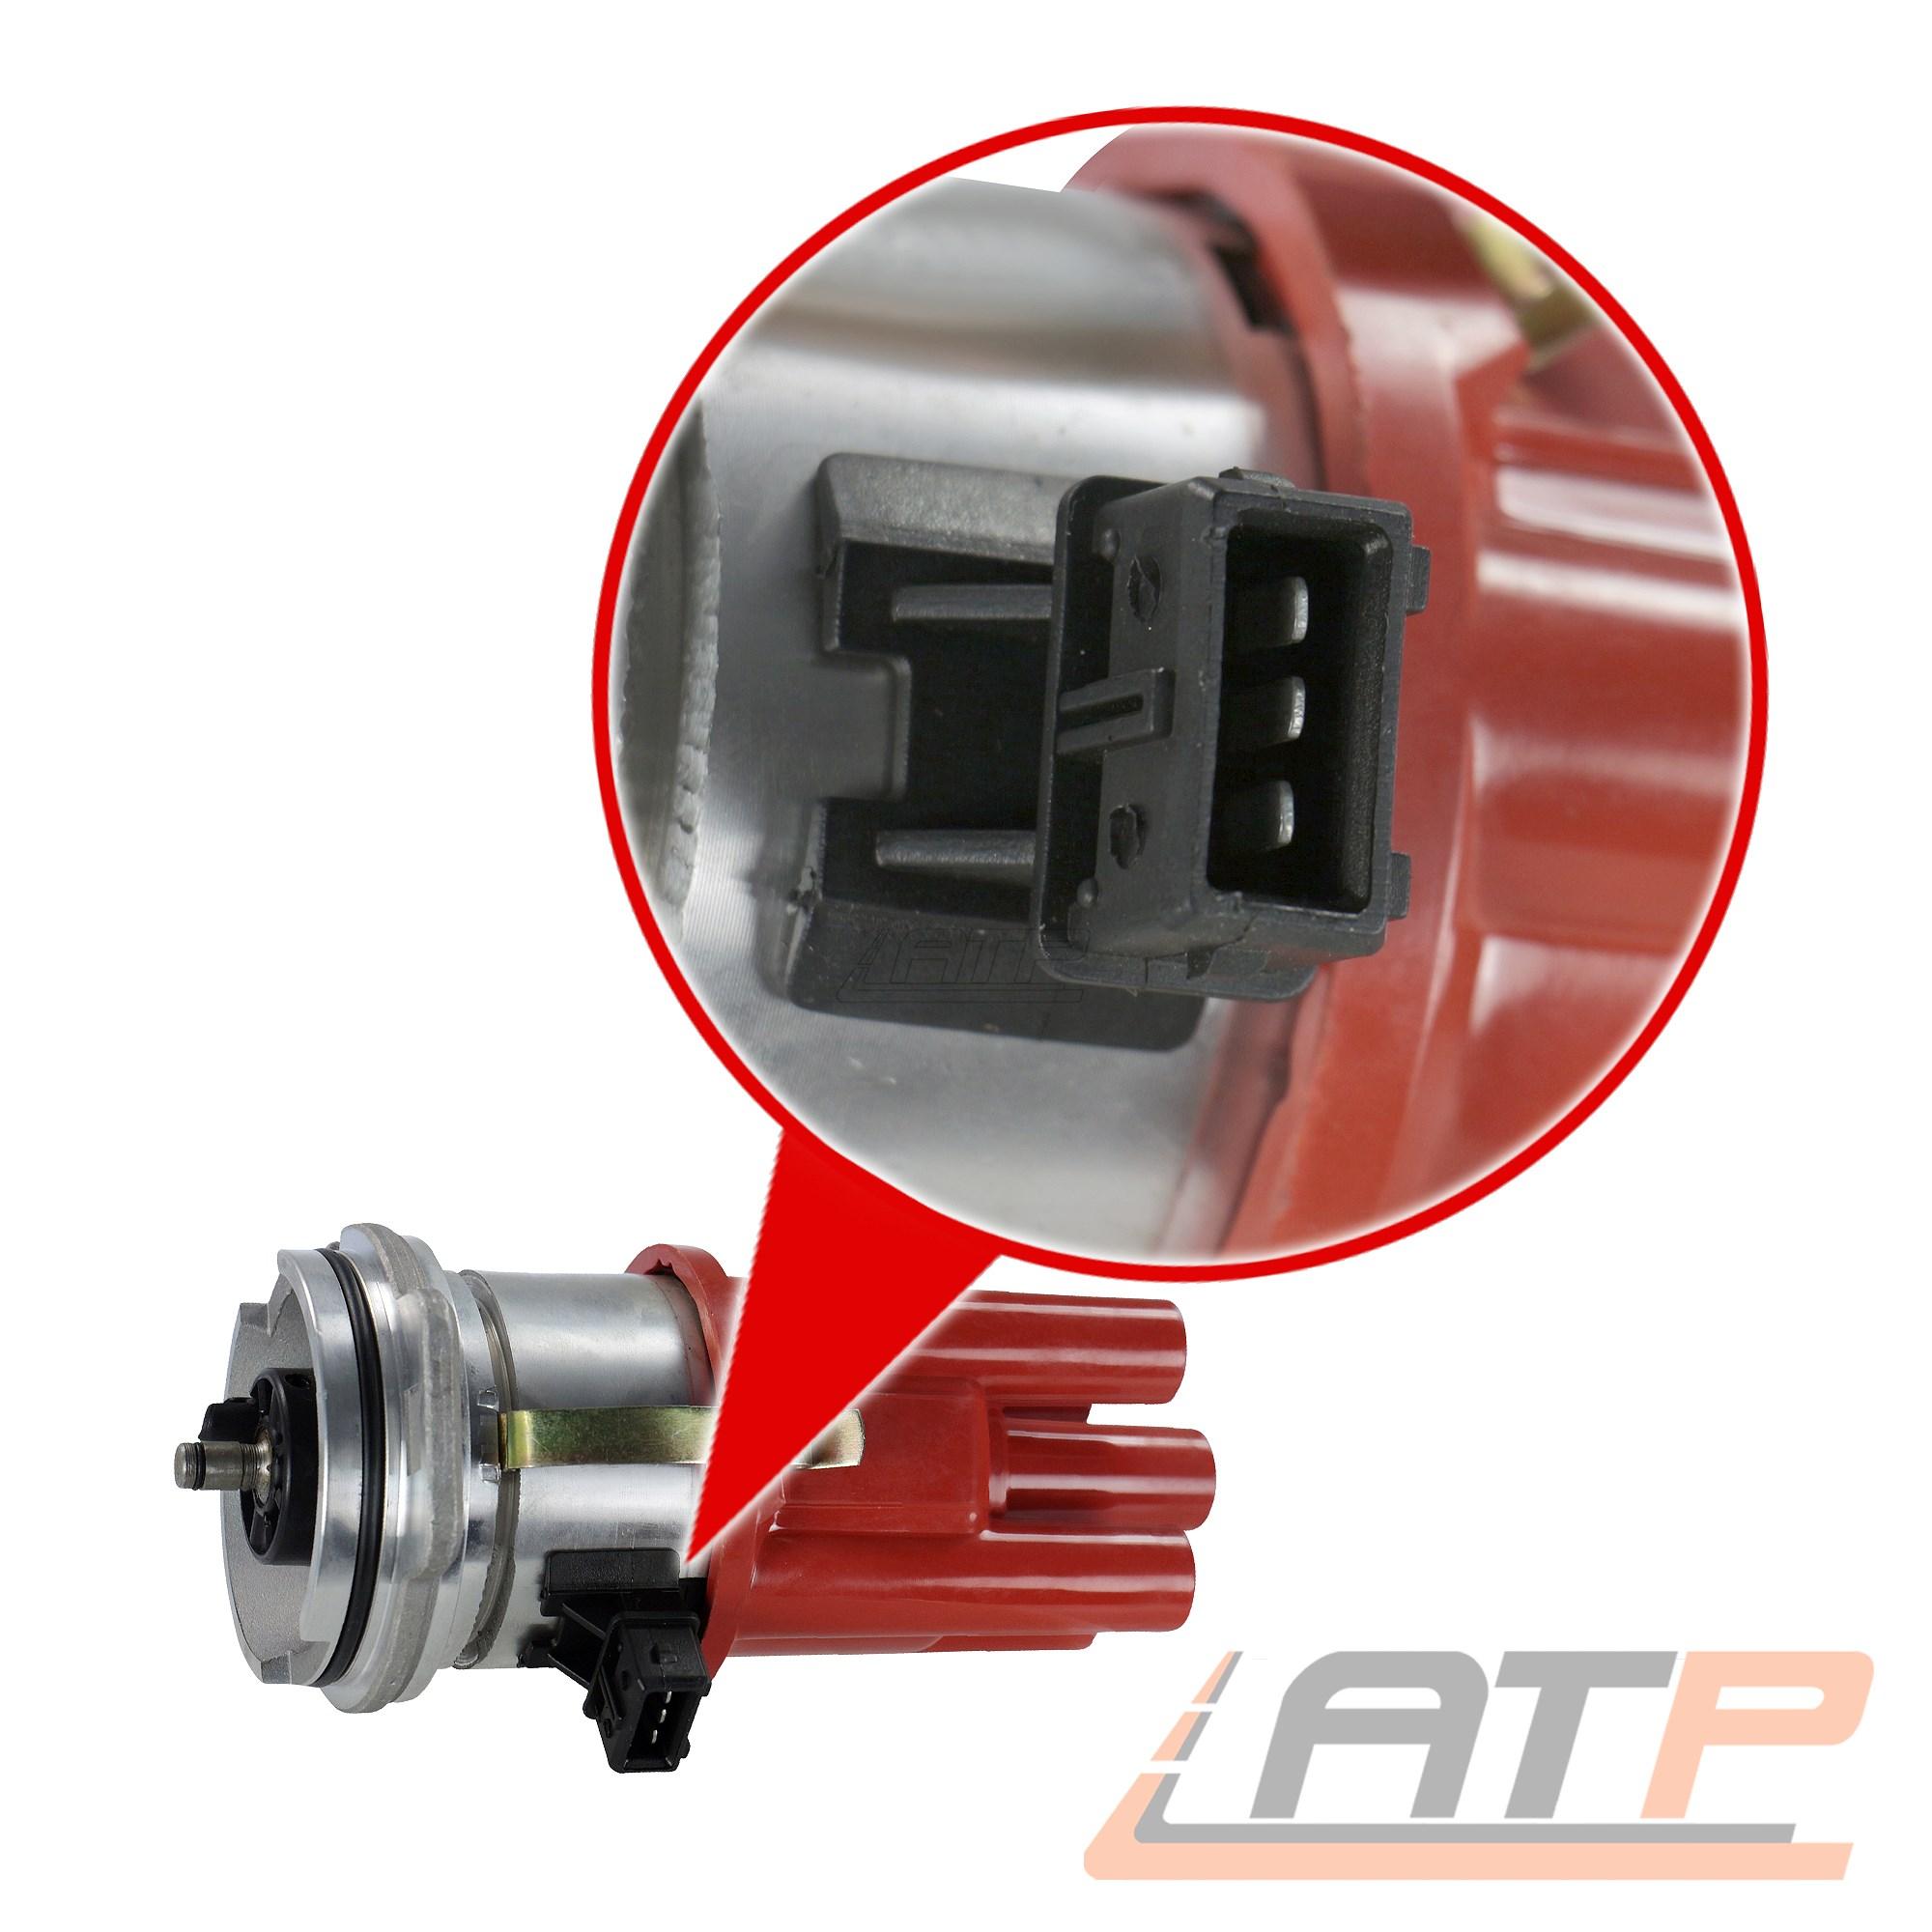 Distributeur ALLUMEUR Opel Corsa A B 1.2 I 1.4 I Bj 03.93-08.00